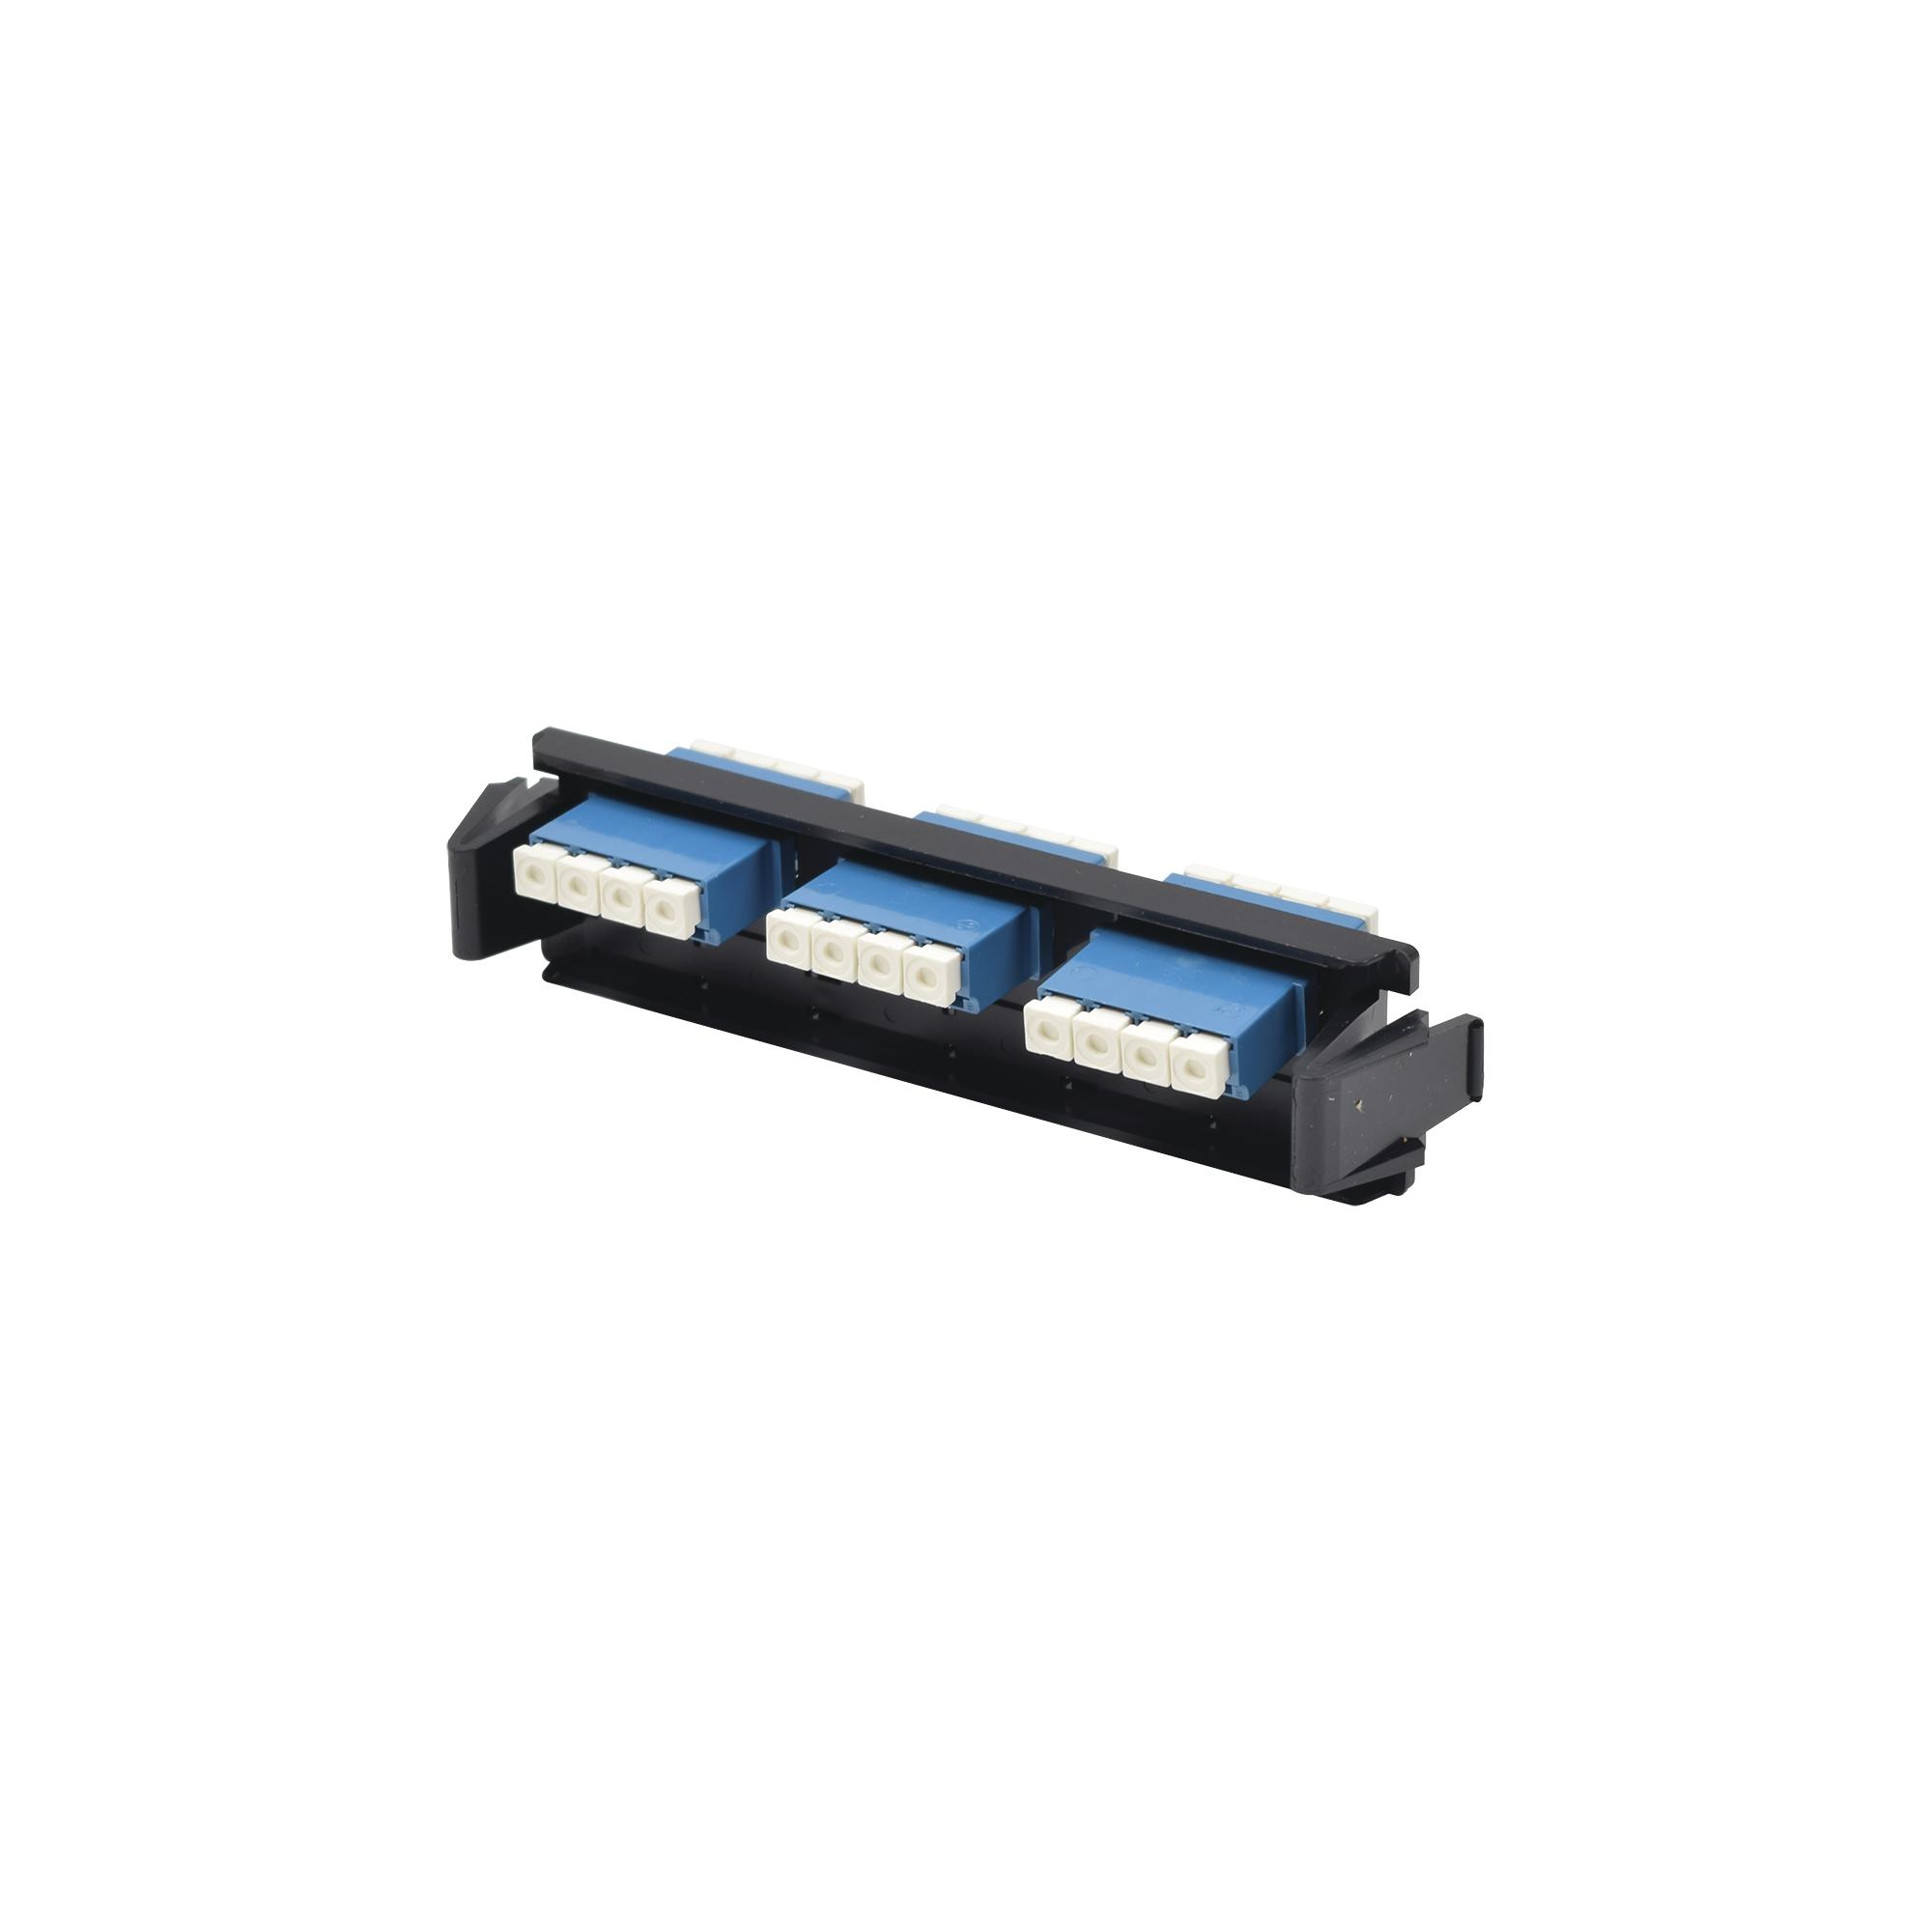 Placa acopladora de Fibra óptica Quick-Pack, Con 6 Conectores LC/UPC Duplex (12 Fibras), Para Fibra Monomodo, Azul